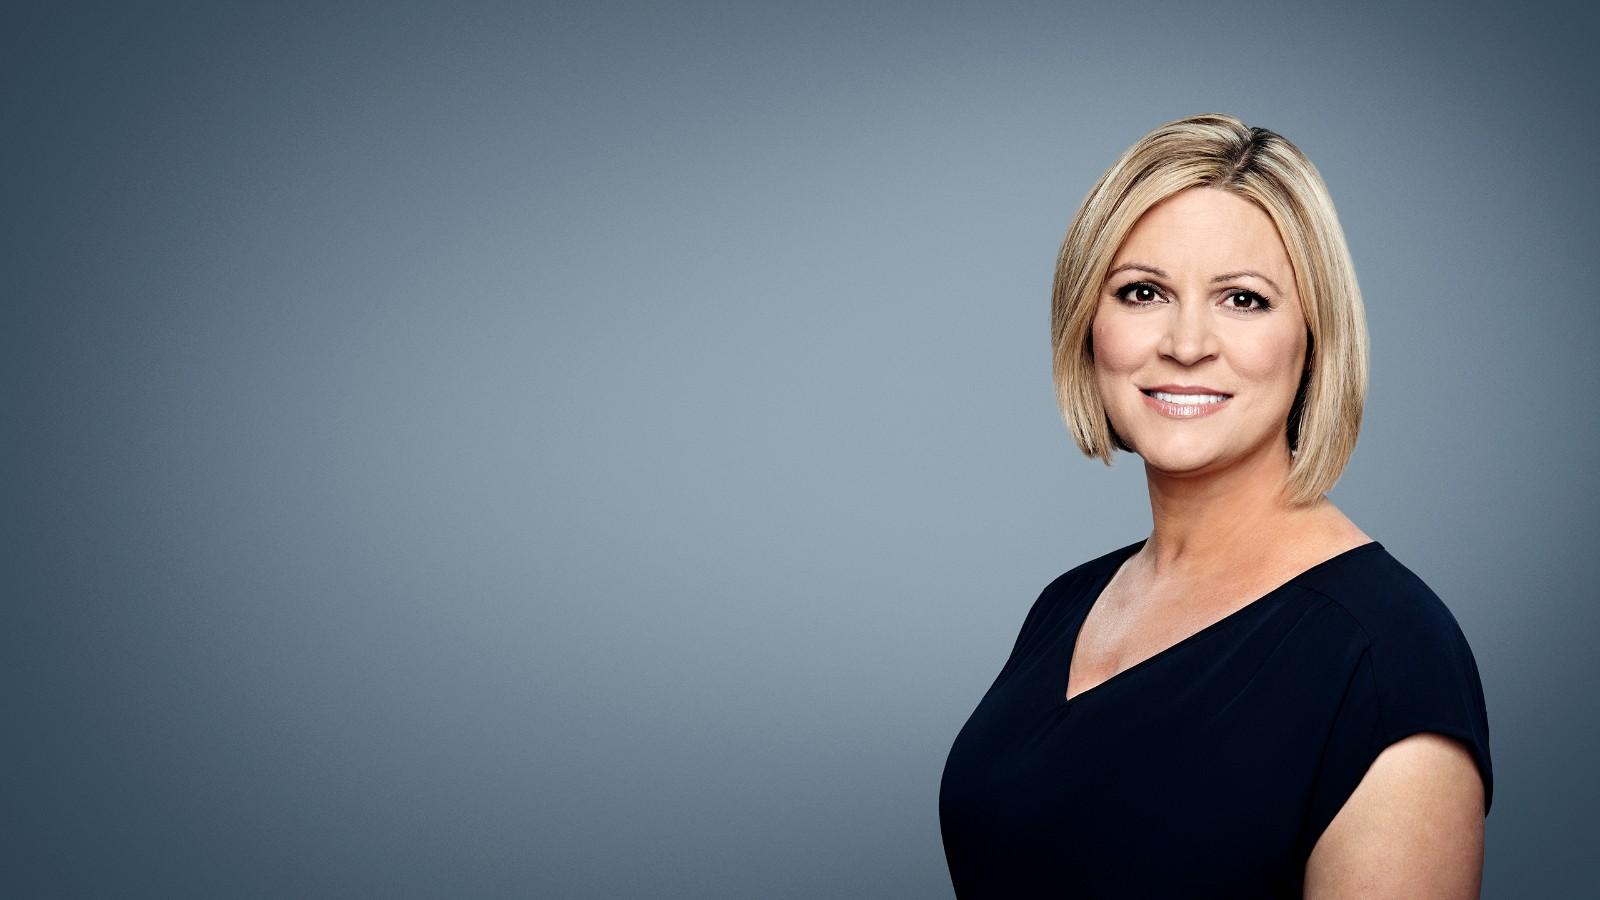 Cnn Profiles Jennifer Westhoven Cnn